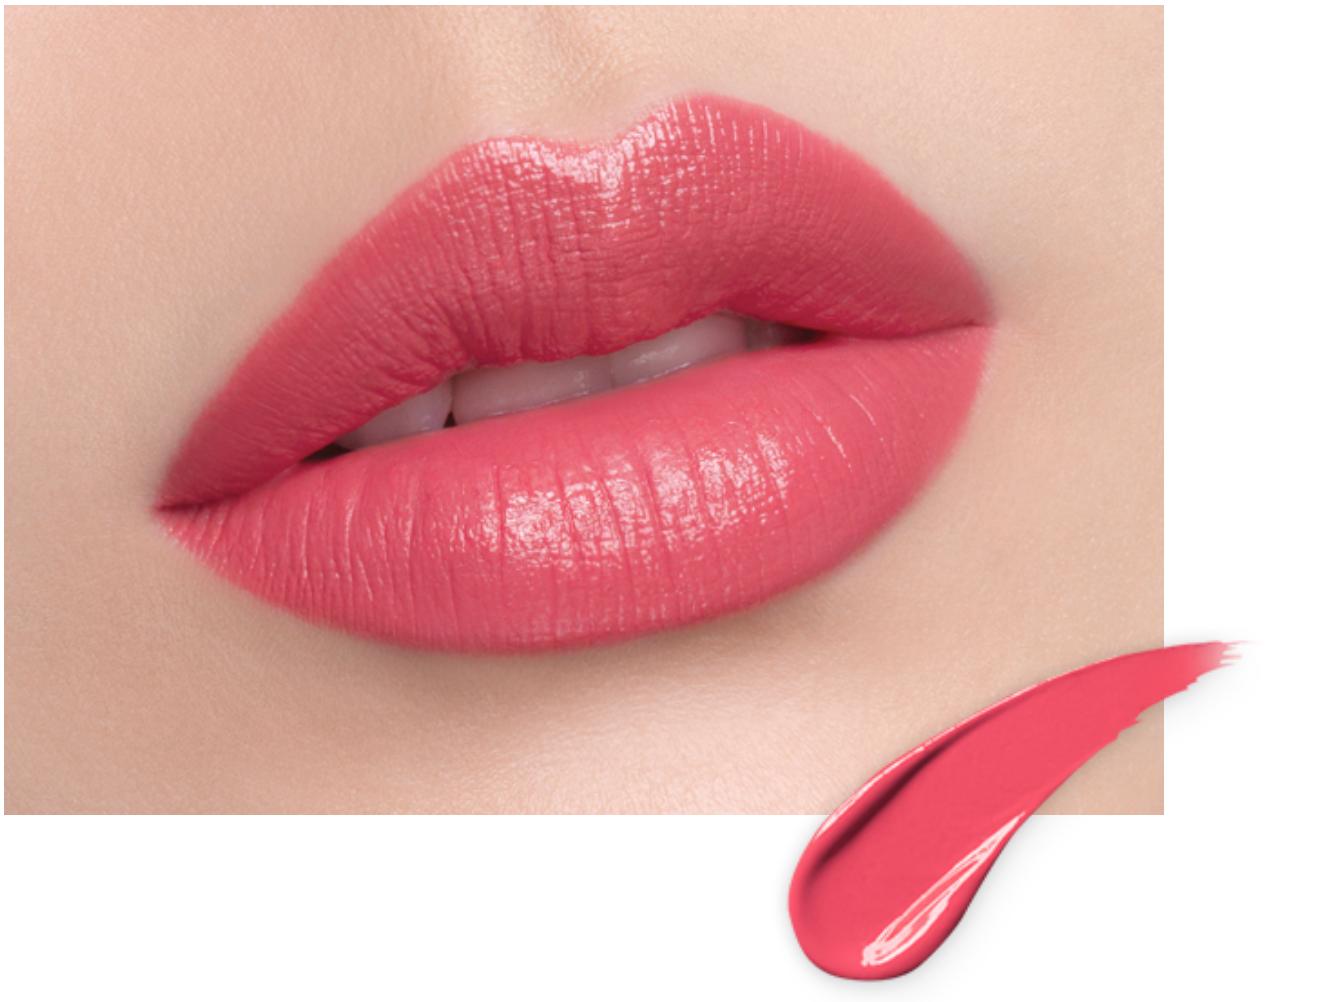 laneige-silk-intense-lipstick-245.png